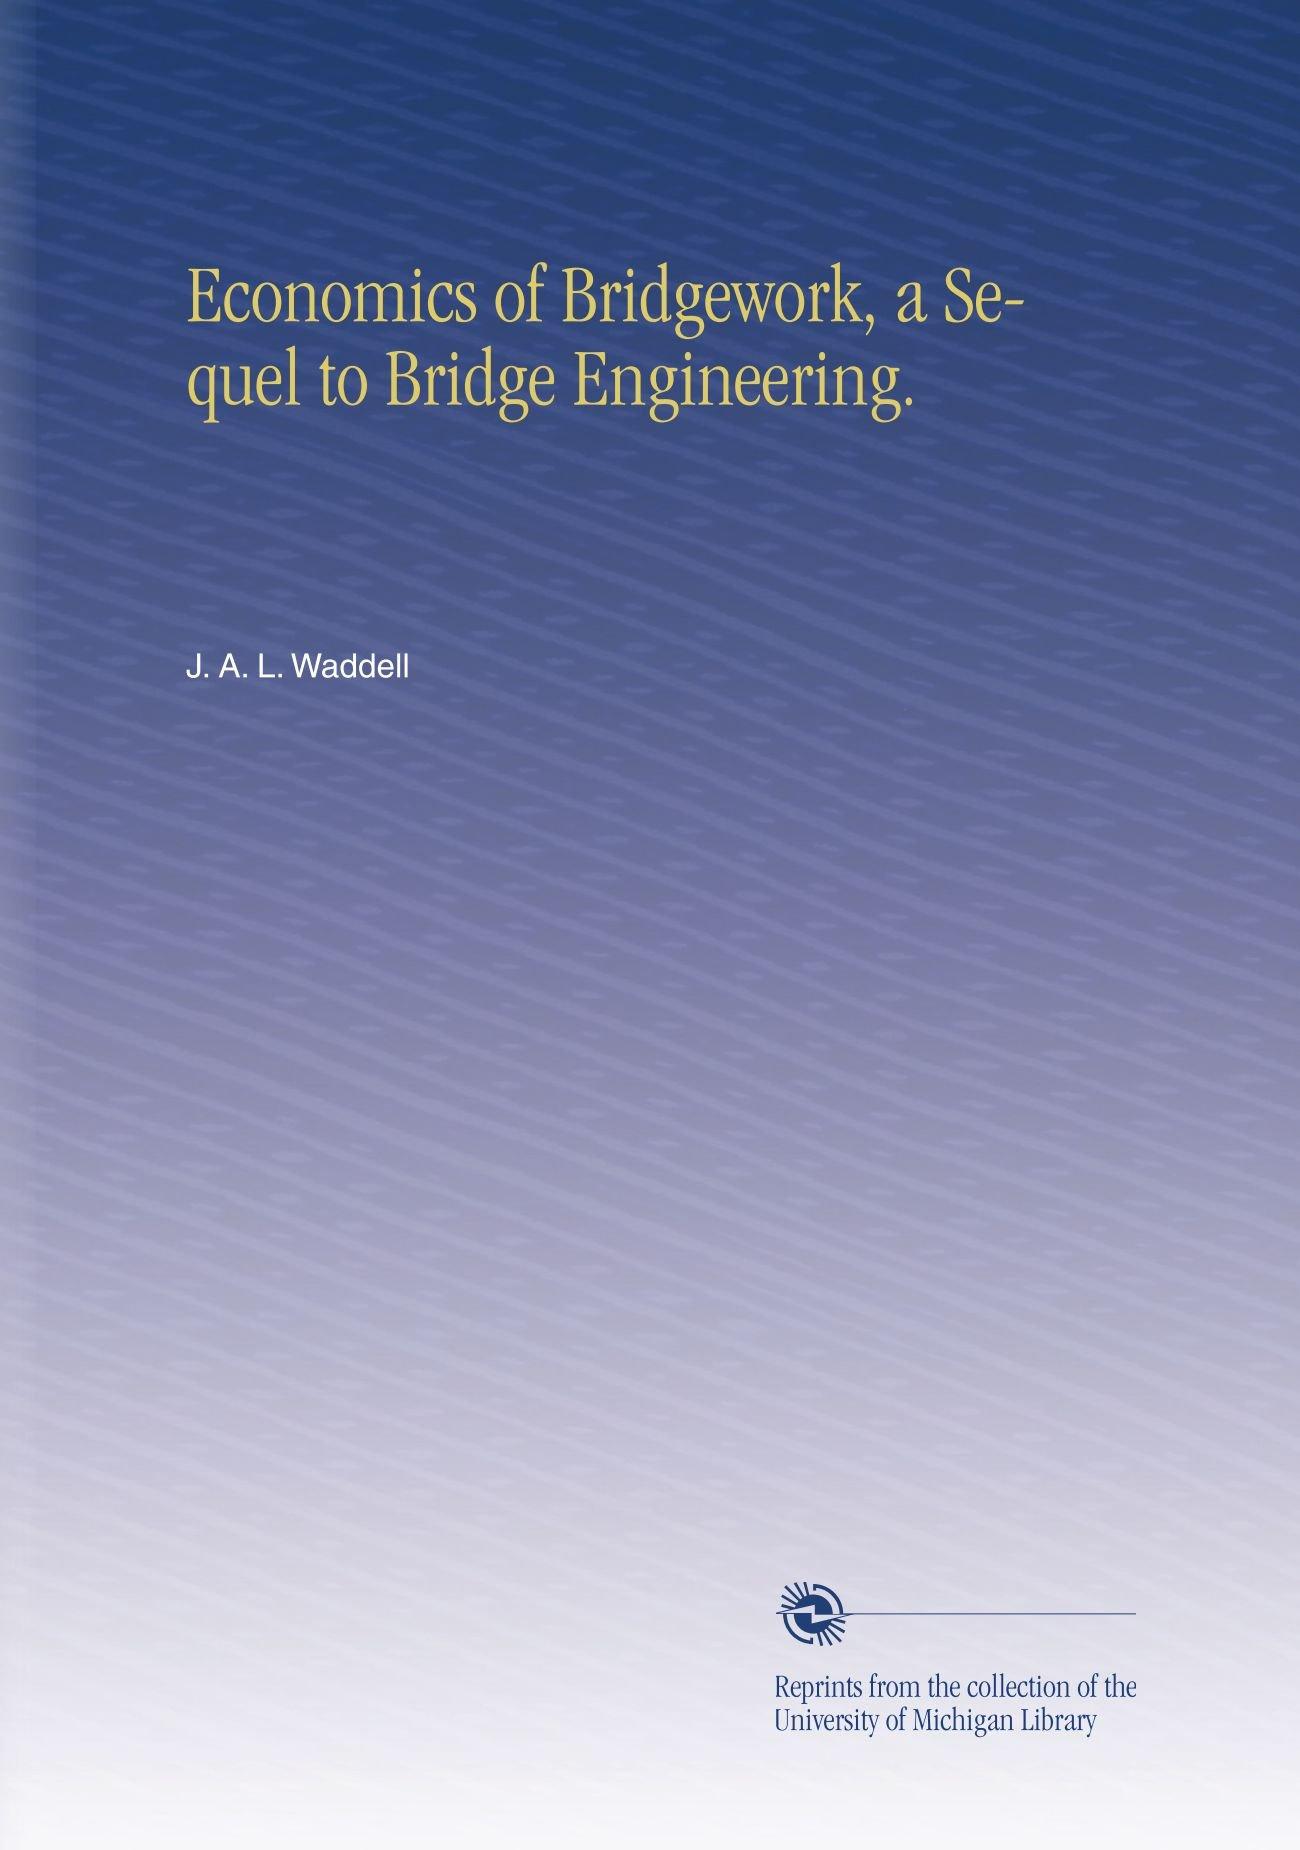 Economics of Bridgework, a Sequel to Bridge Engineering.